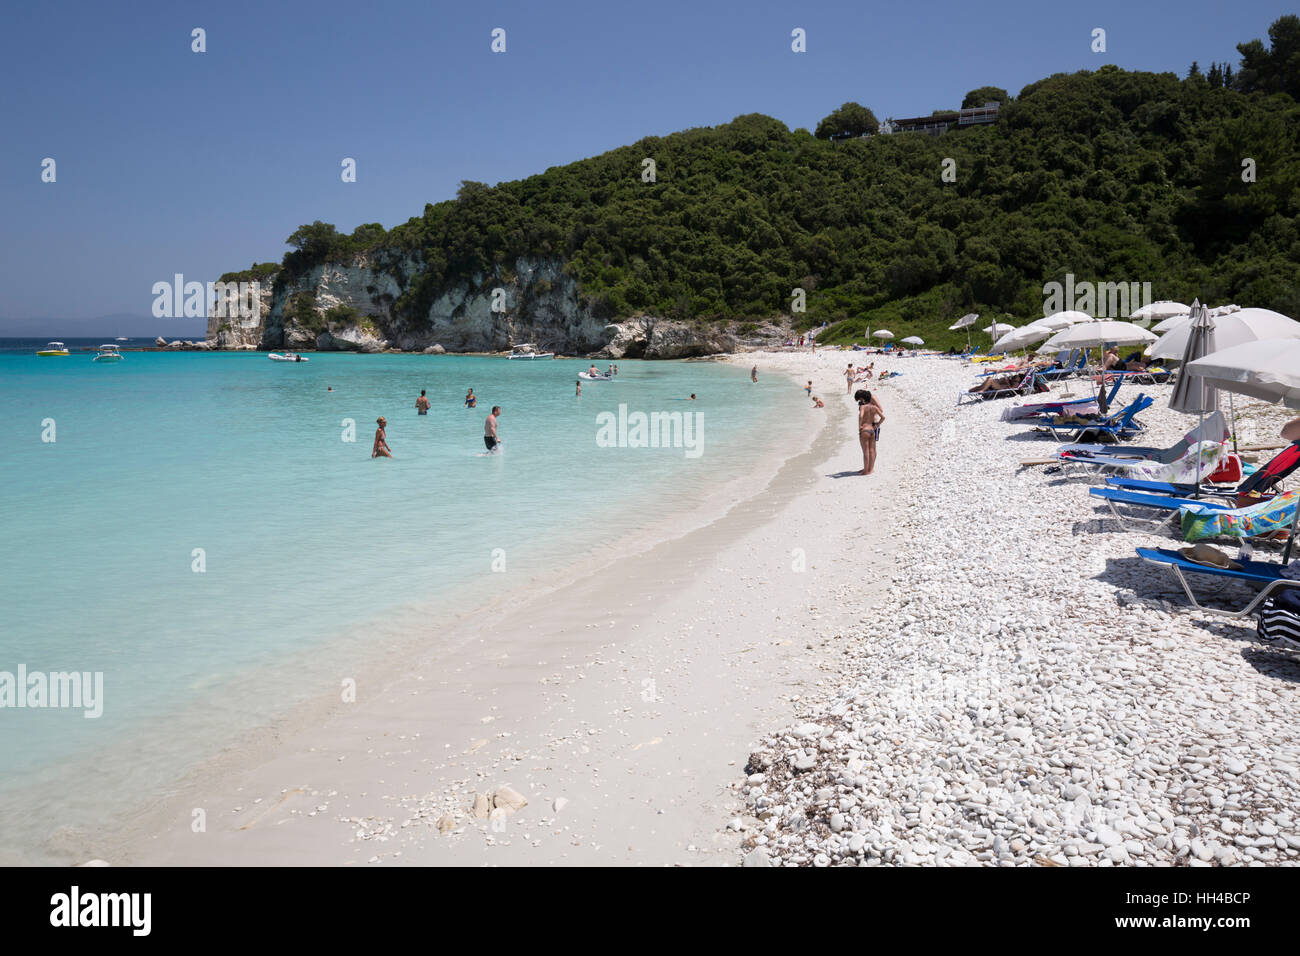 Voutoumi beach, Antipaxos, Ionian Islands, Greek Islands, Greece, Europe - Stock Image